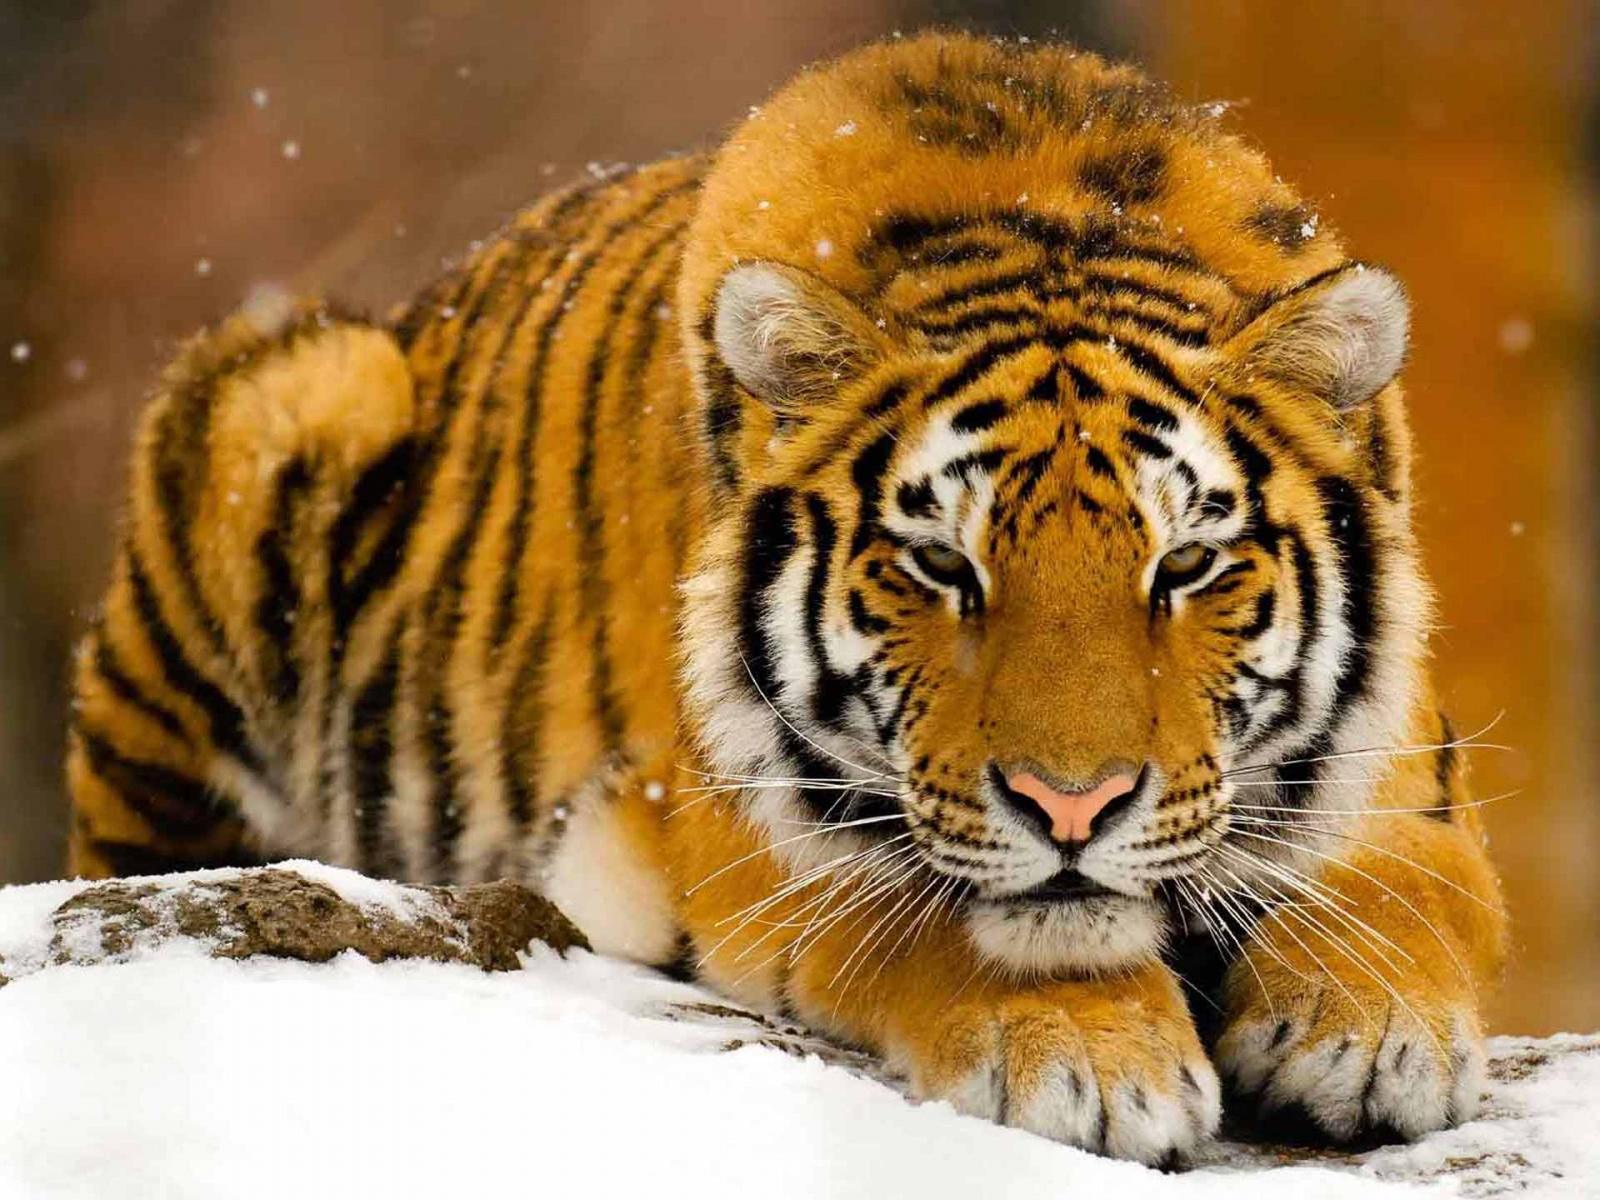 Best Desktop HD Wallpaper - Tiger HD wallpapers